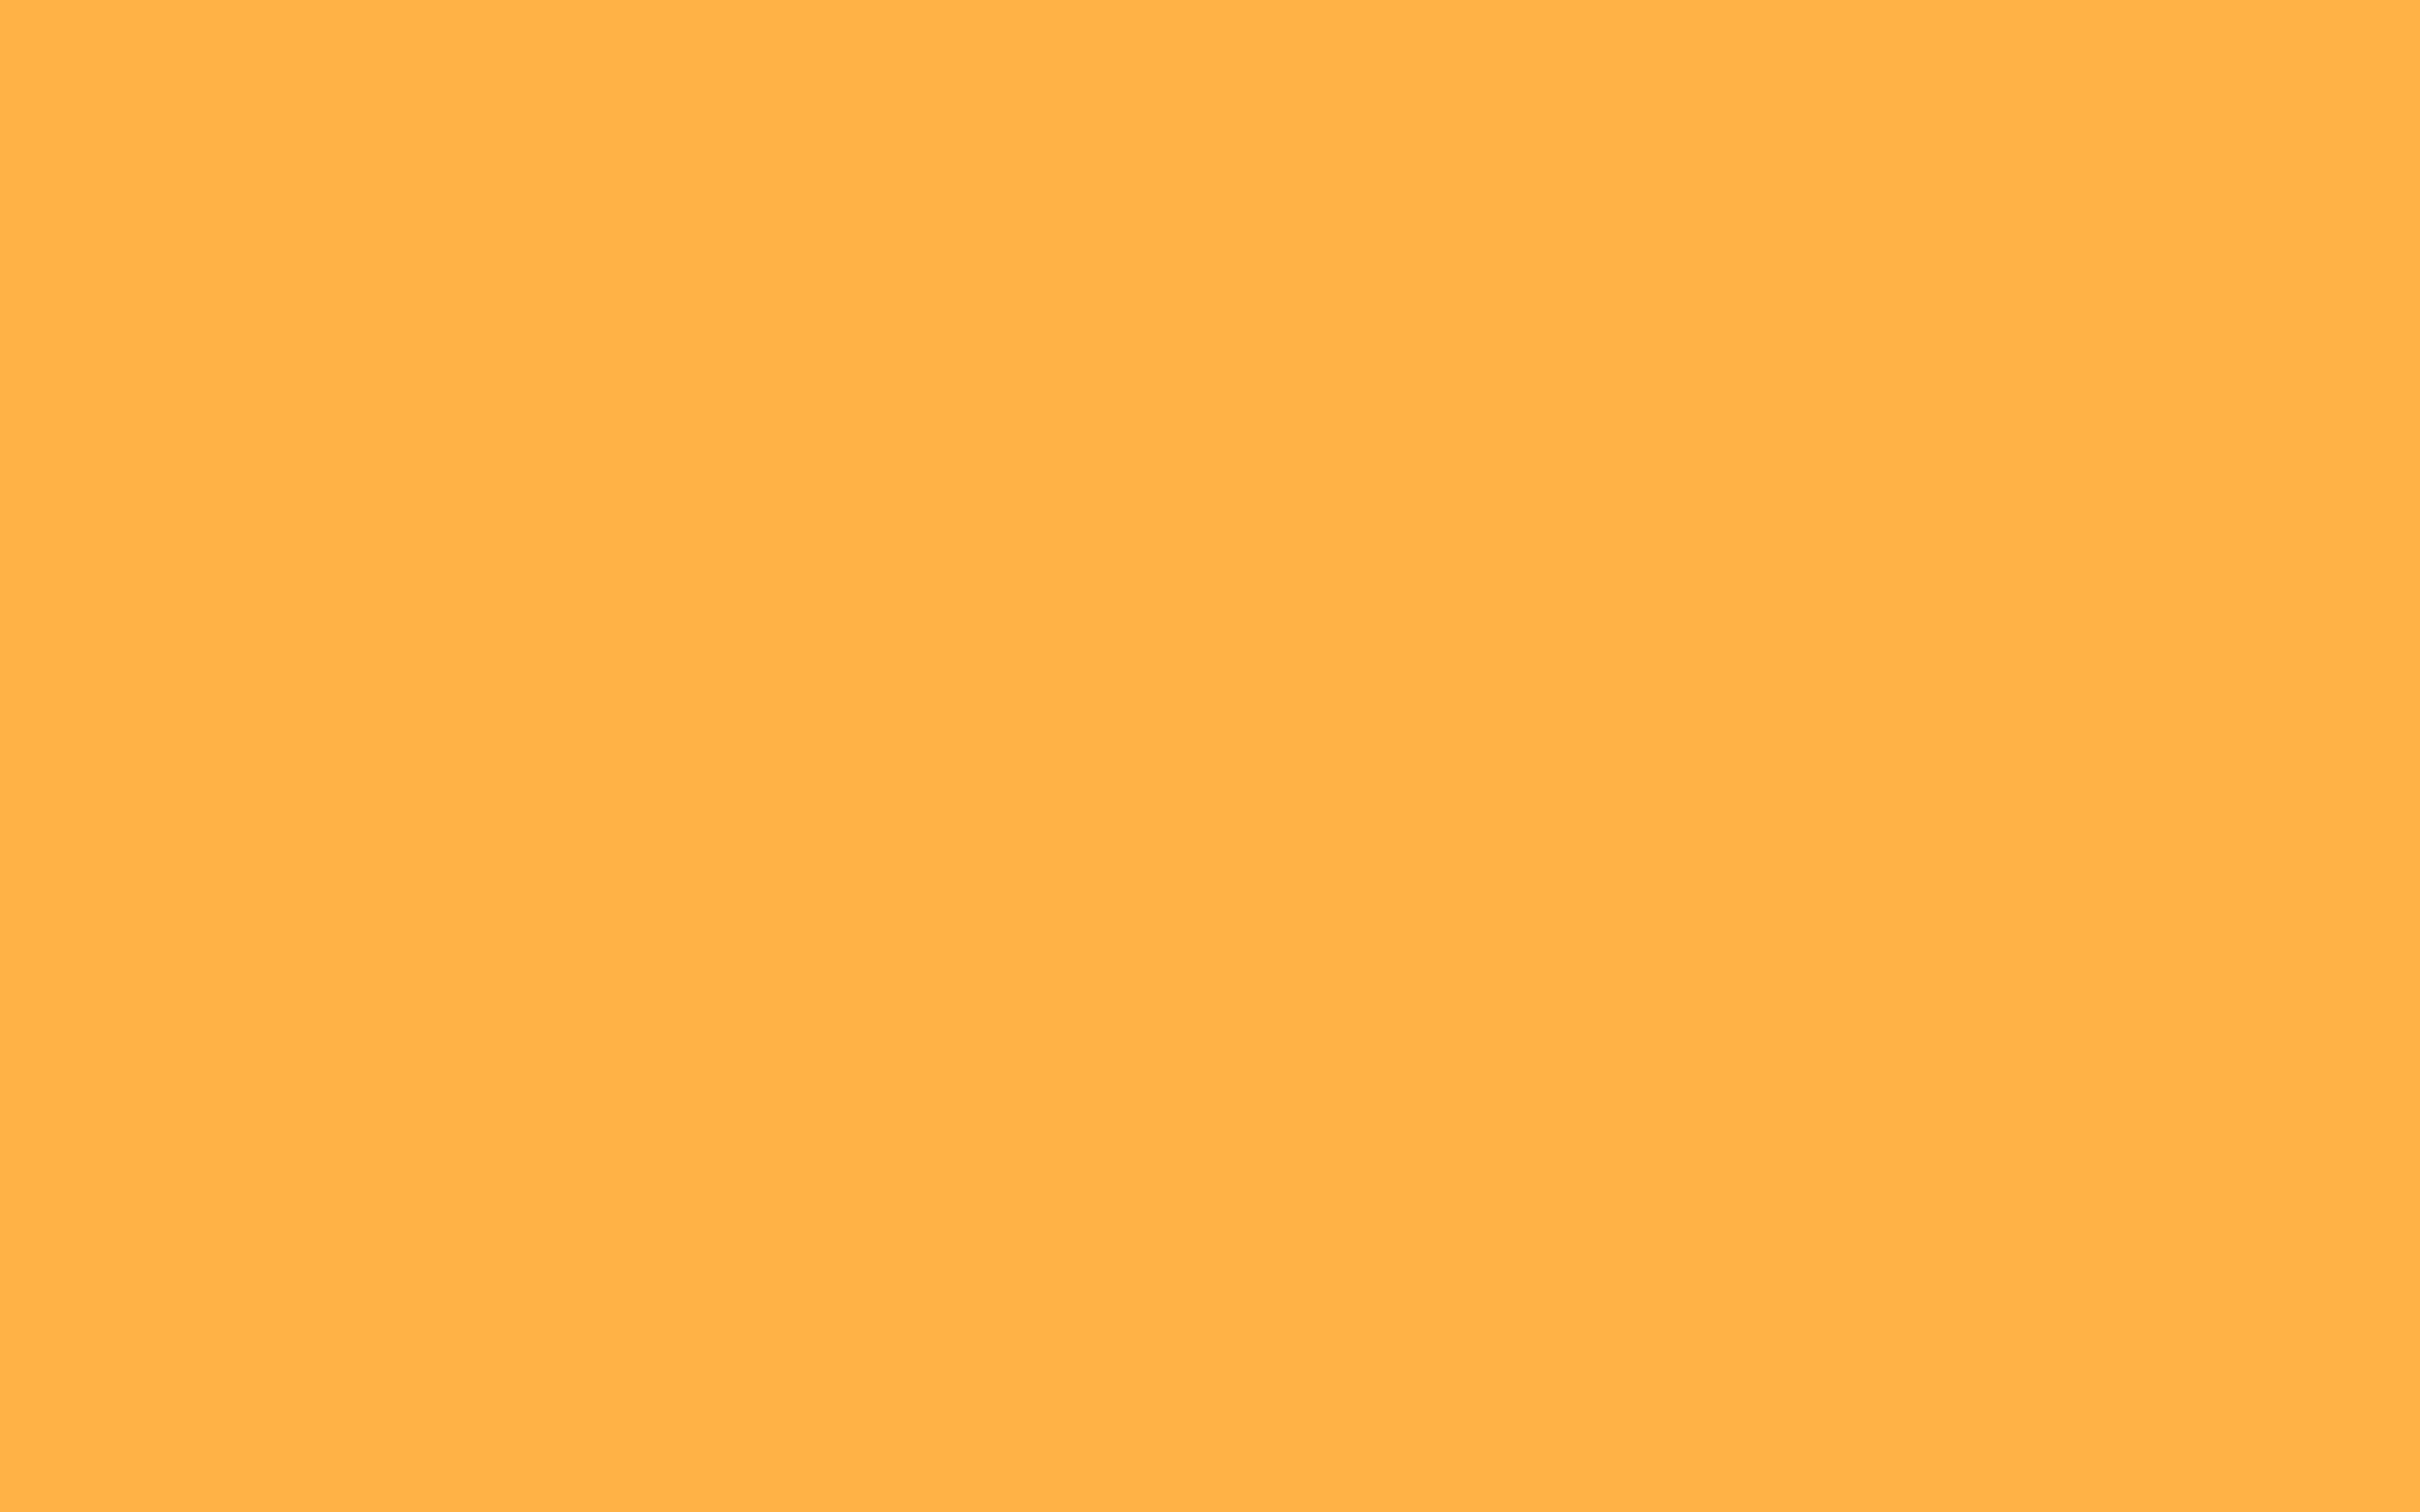 2560x1600 Pastel Orange Solid Color Background